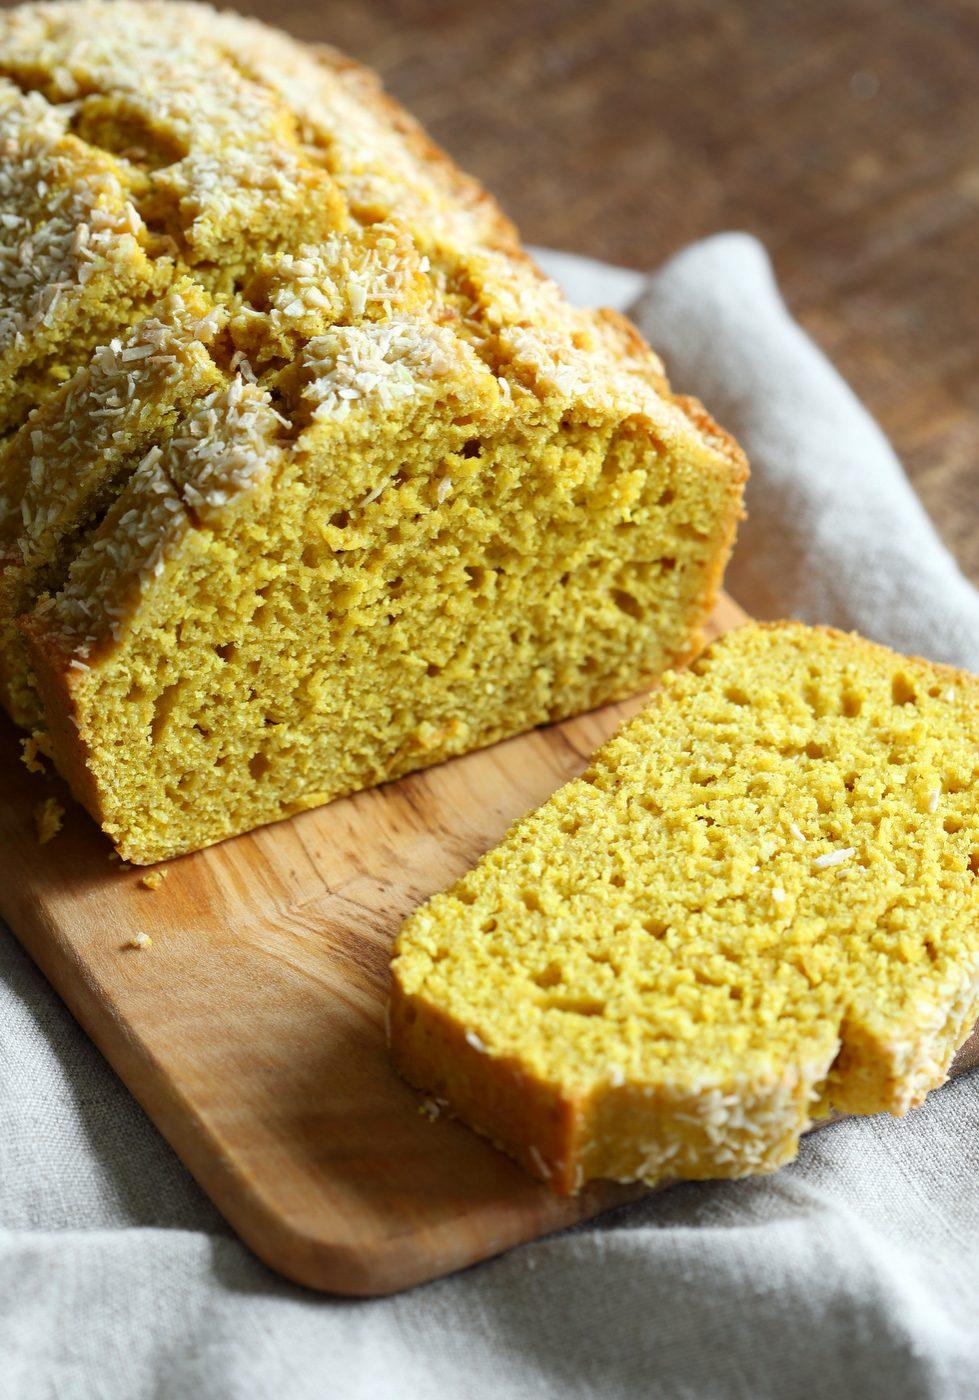 Vegan-coconut-turmeric-bread-veganricha-7242-001